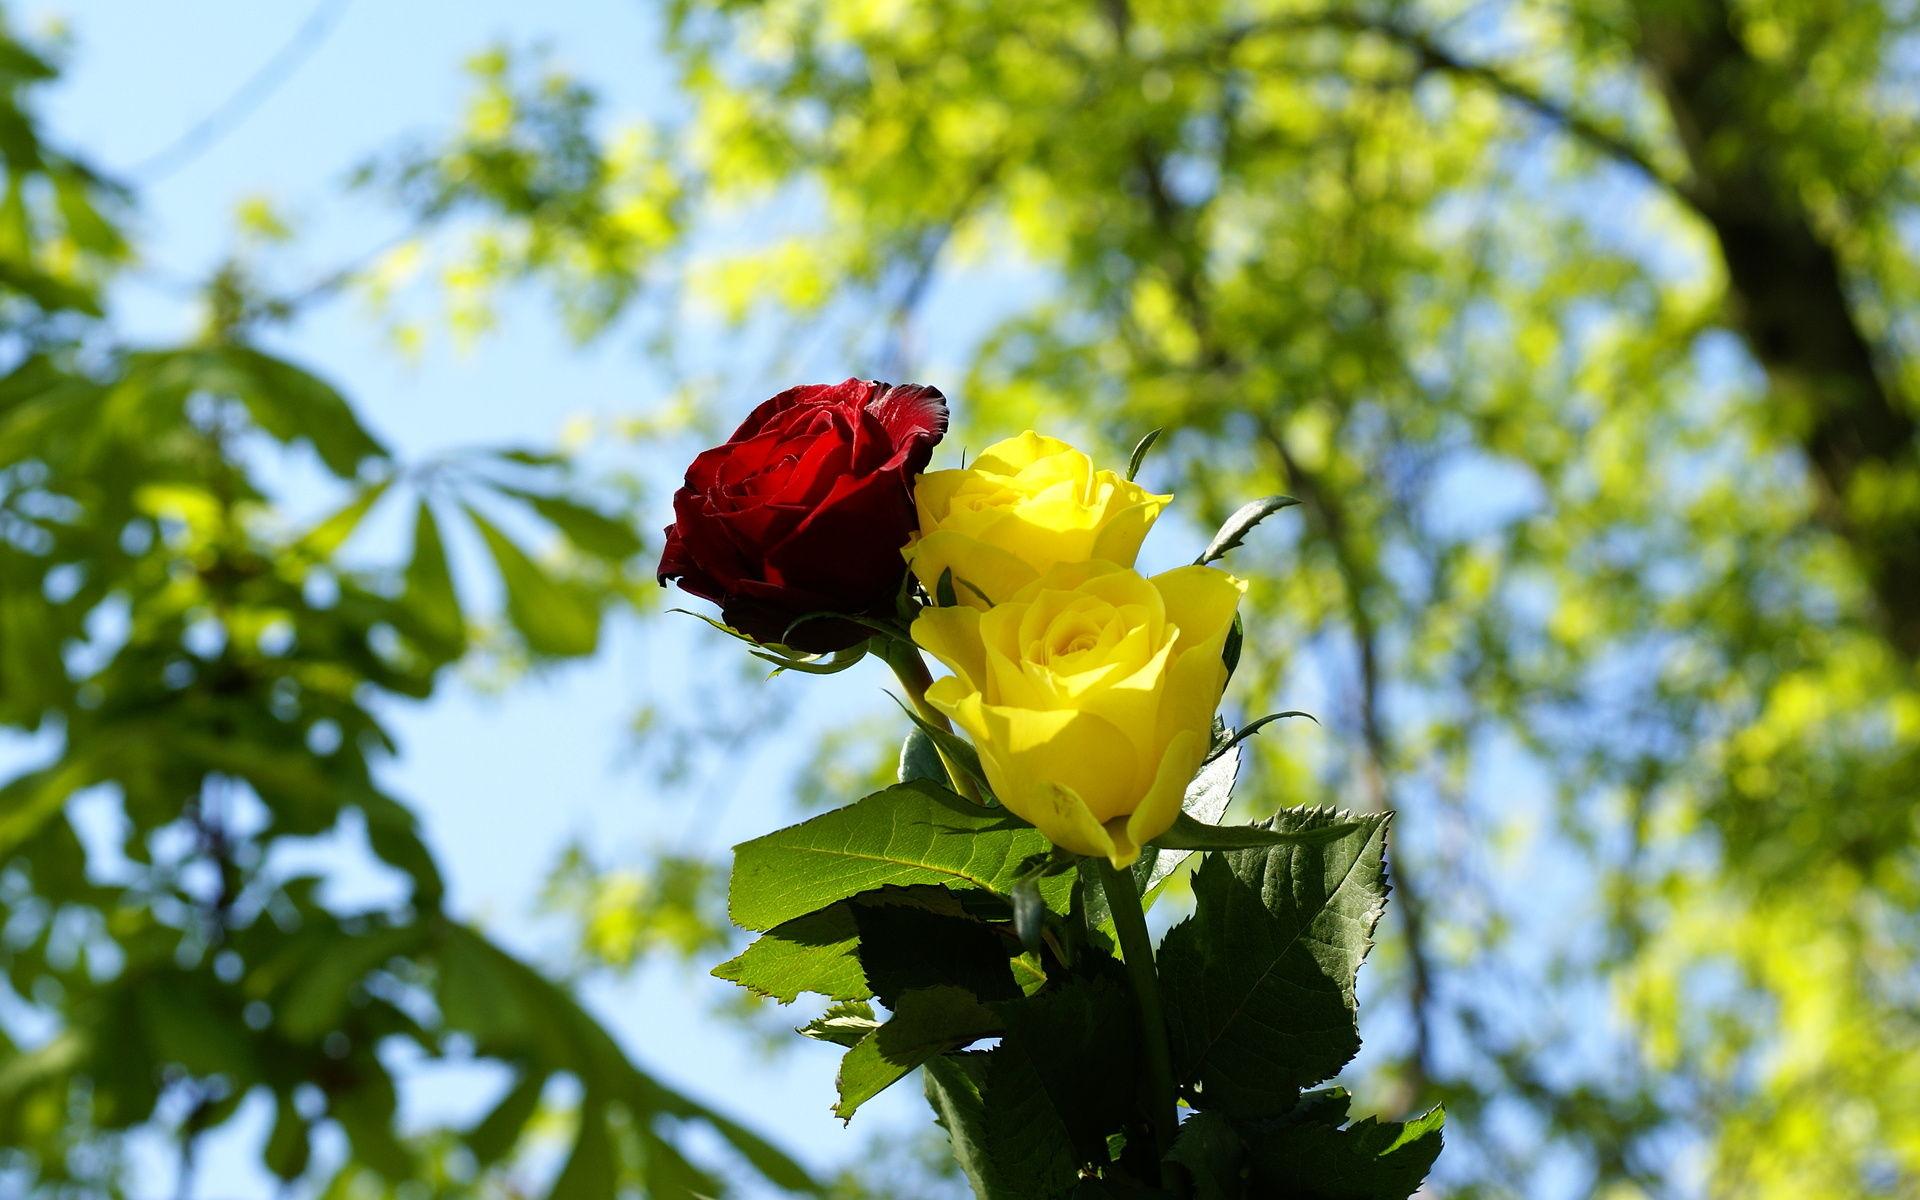 Yellow Roses Images Rose Wallpaper Free Photos Yellow Rose 1920x1200